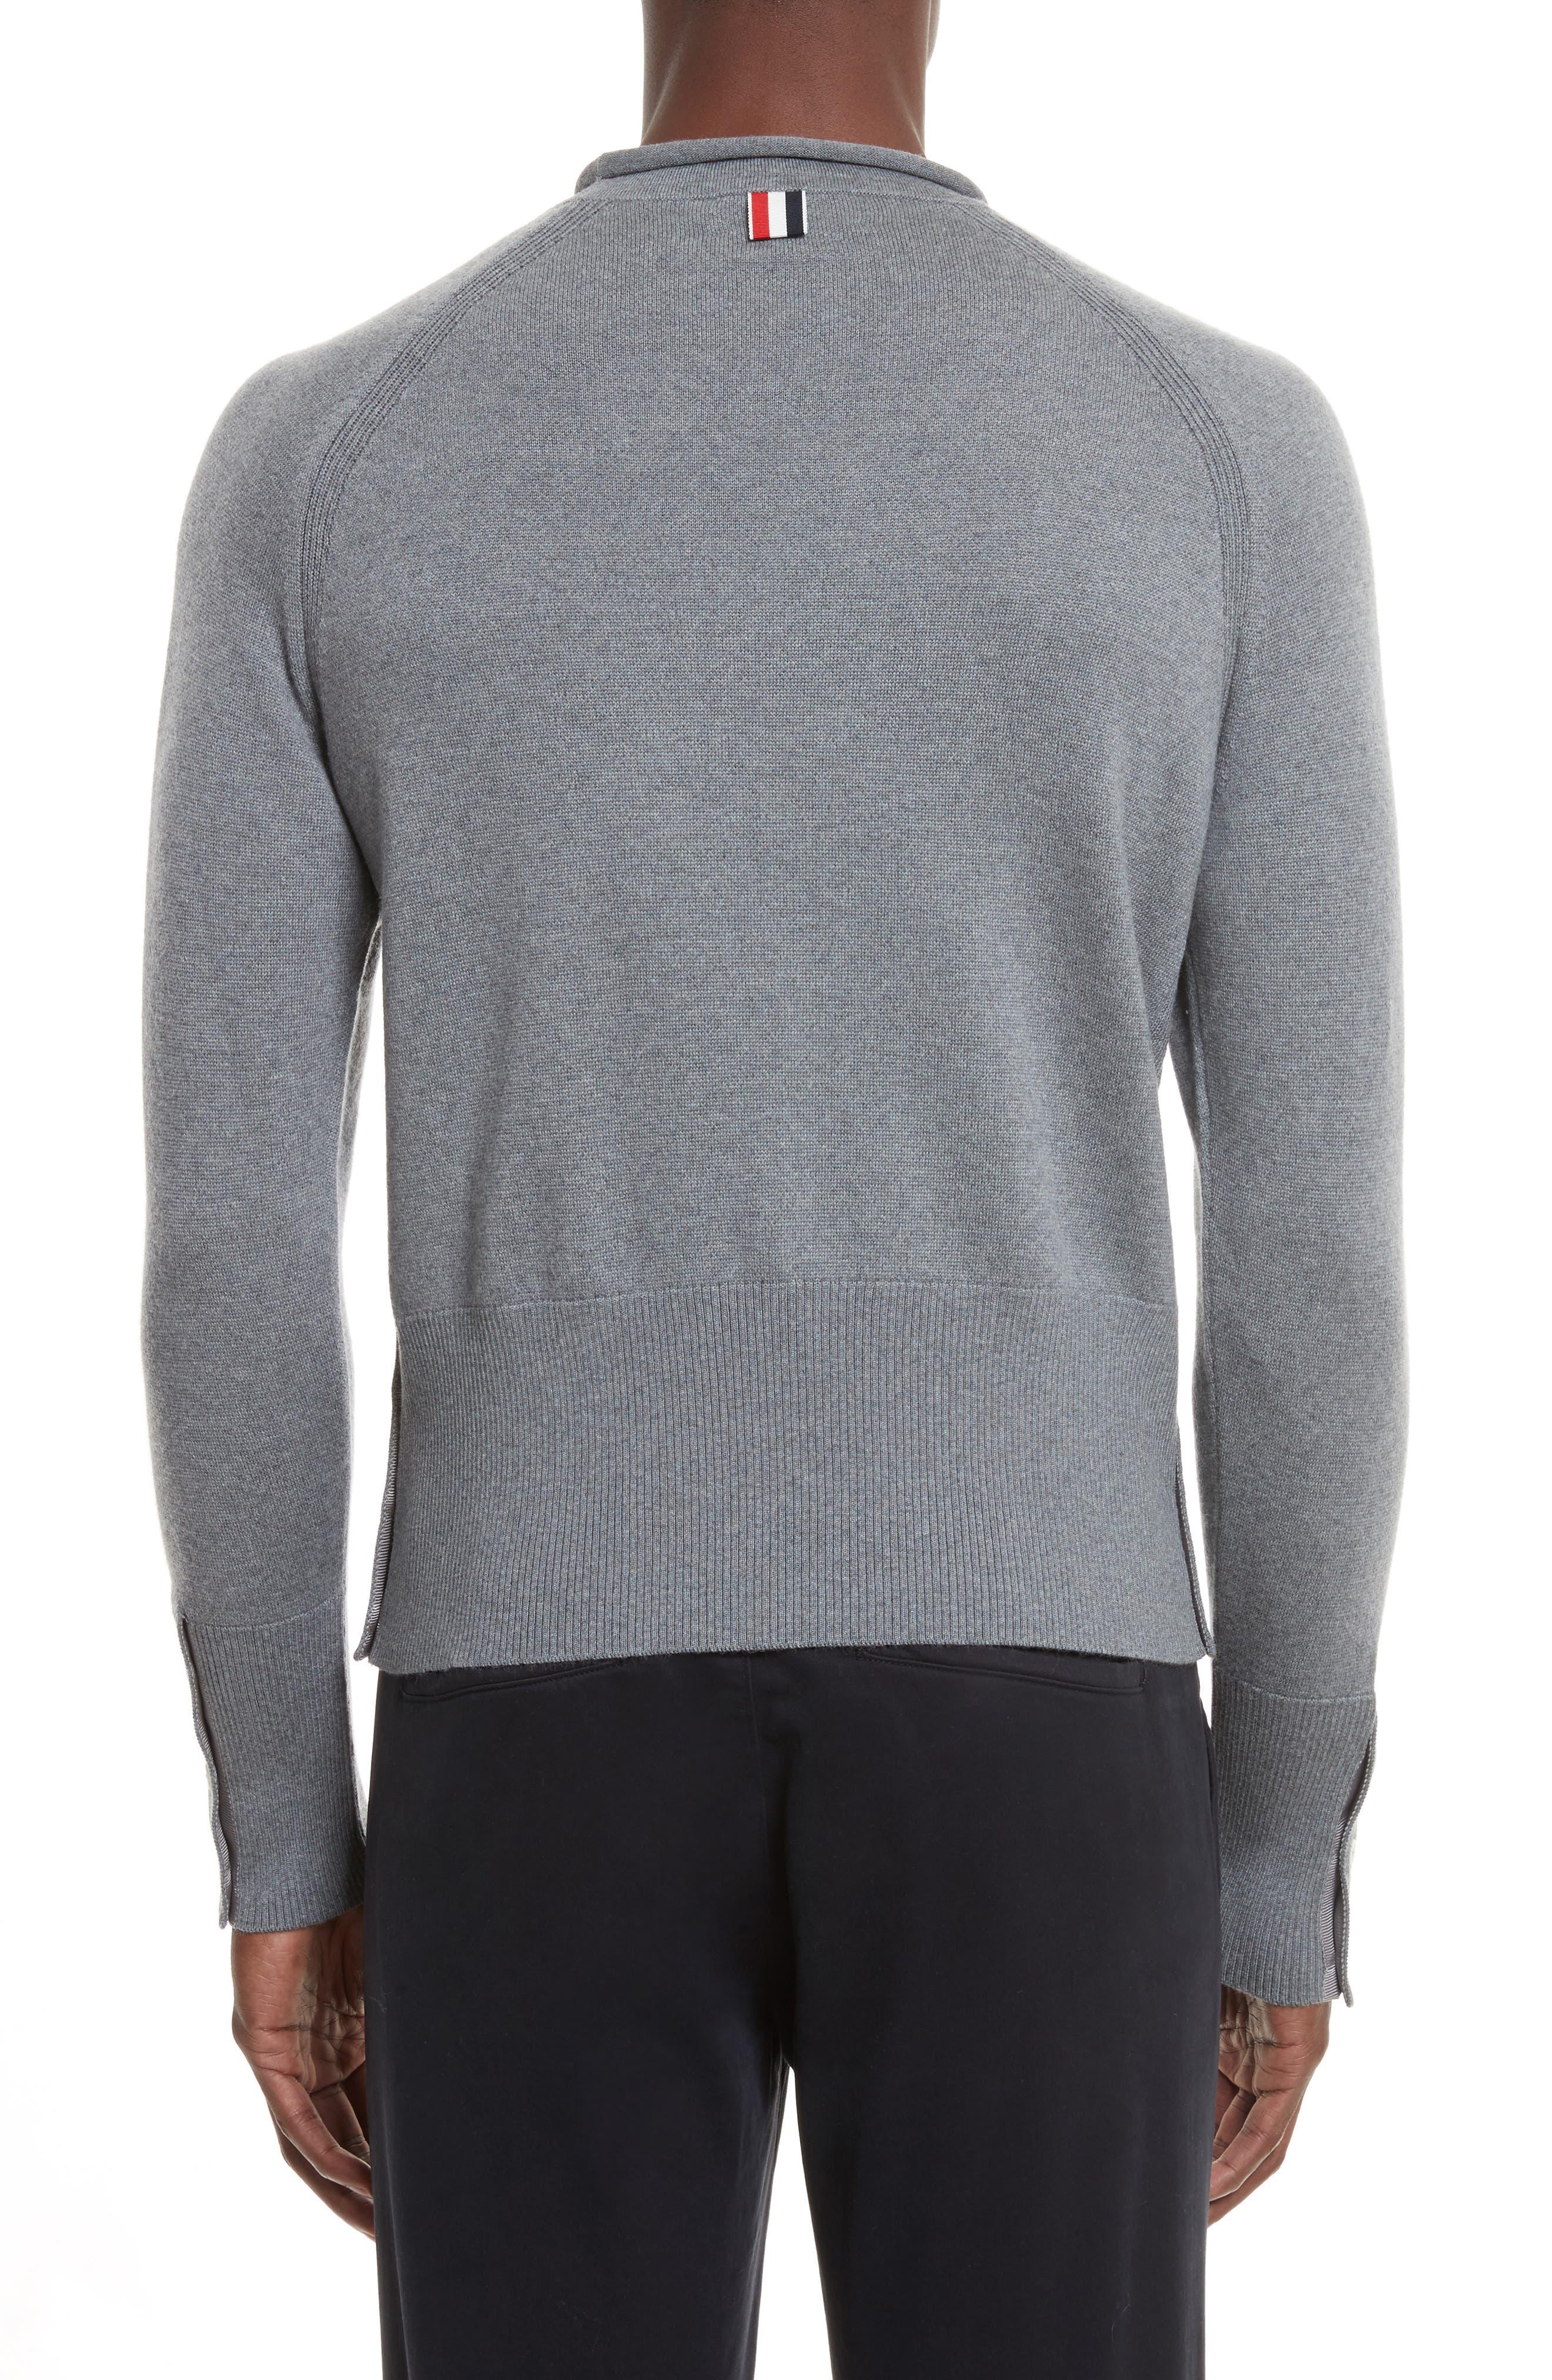 Raglan Merino Wool Sweater,                             Alternate thumbnail 2, color,                             020